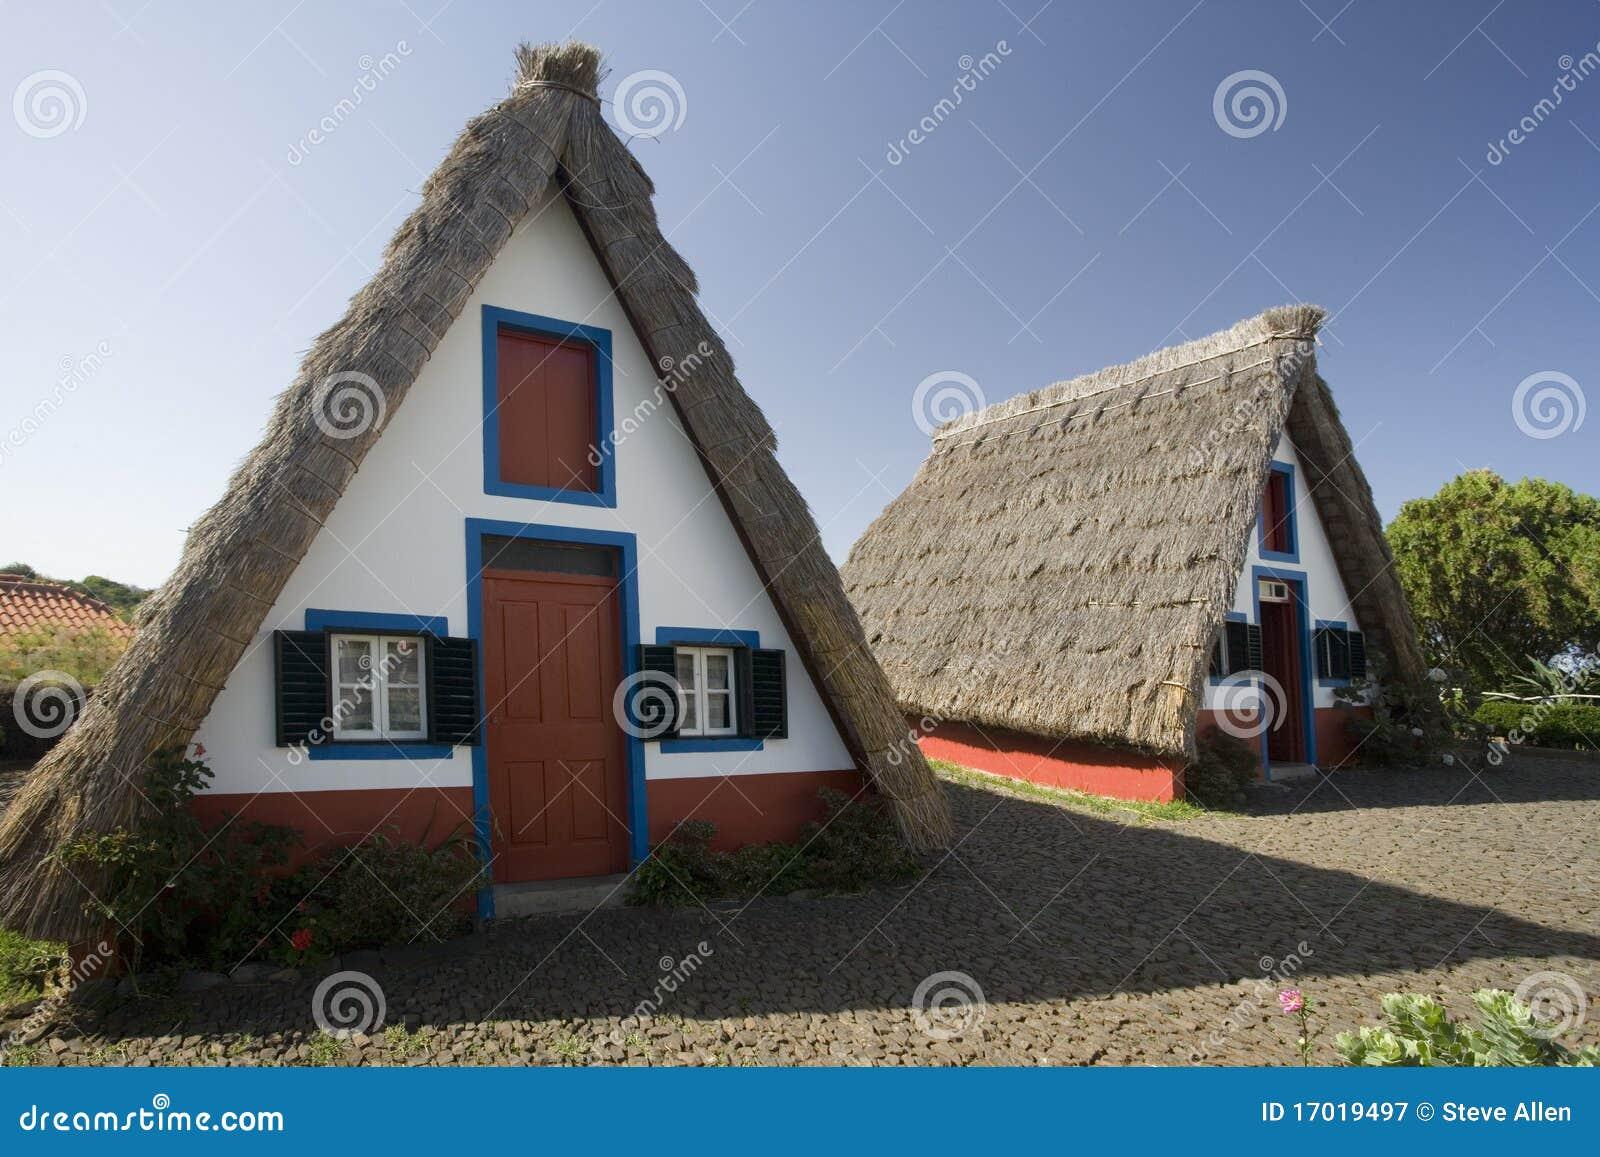 madeira a frame house editorial photography image 17019497 frame house